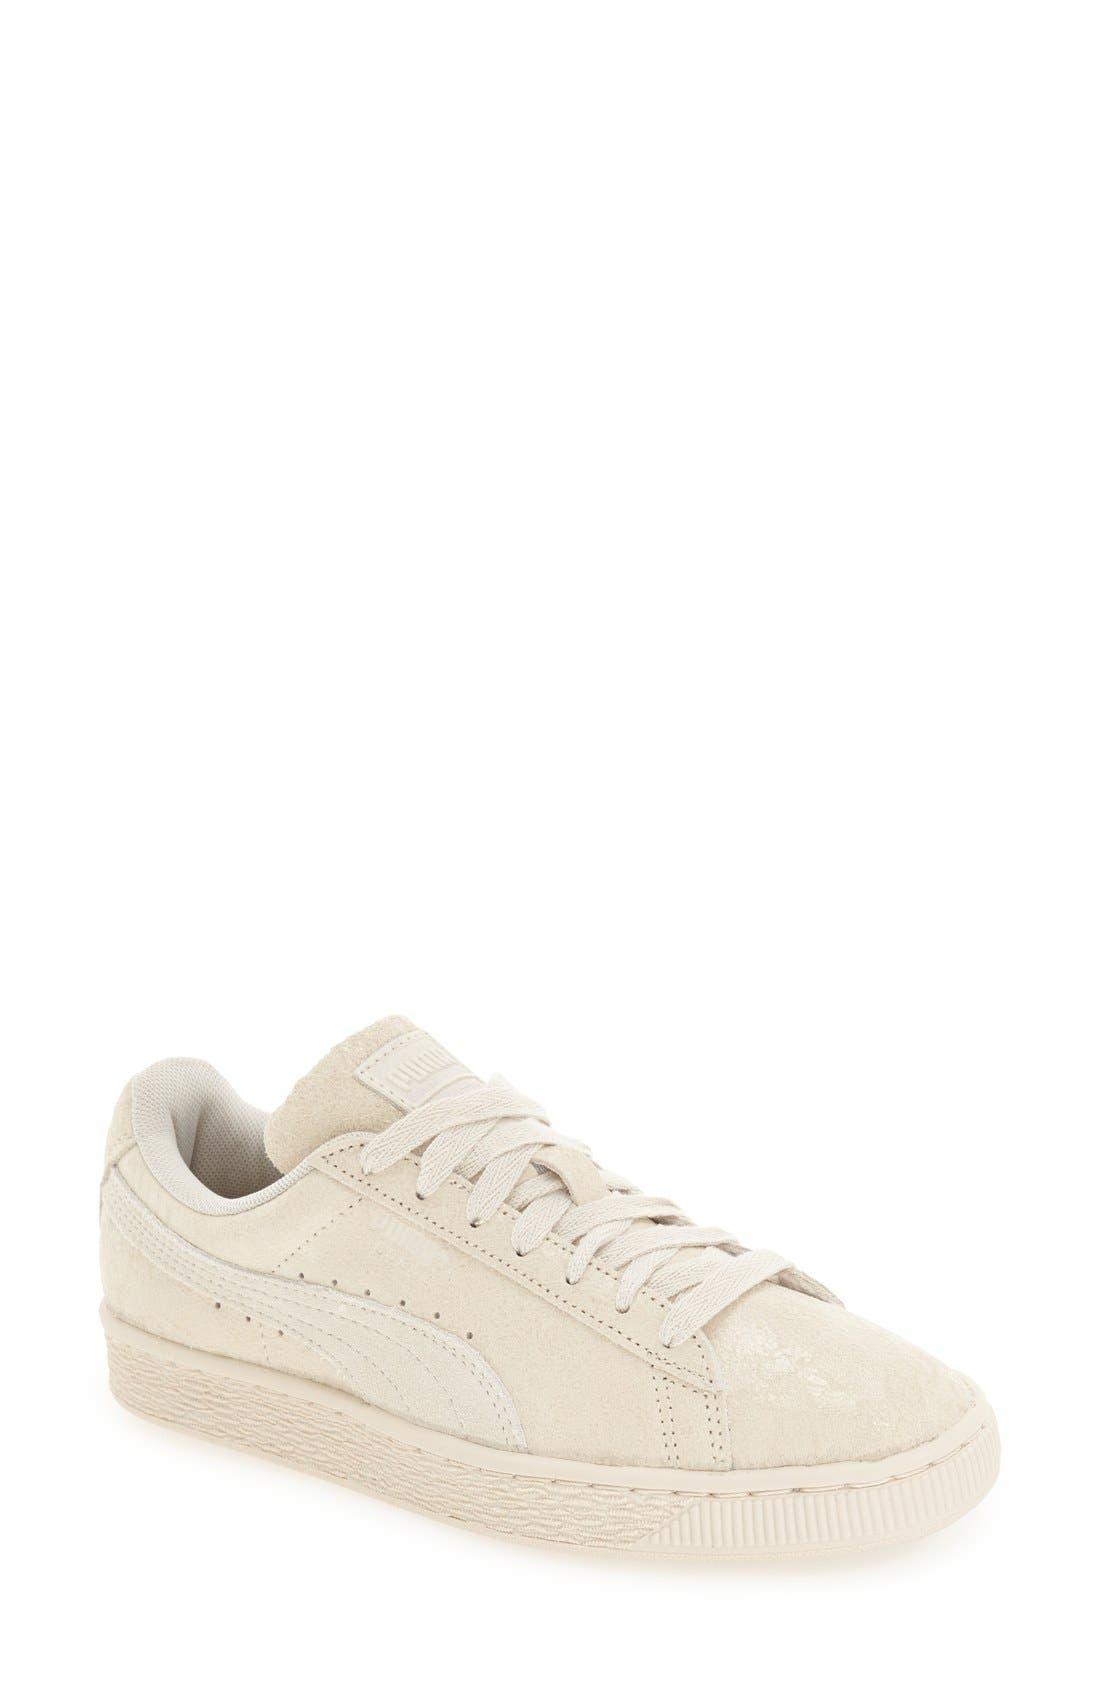 Alternate Image 1 Selected - PUMA 'Remaster' Sneaker (Women)